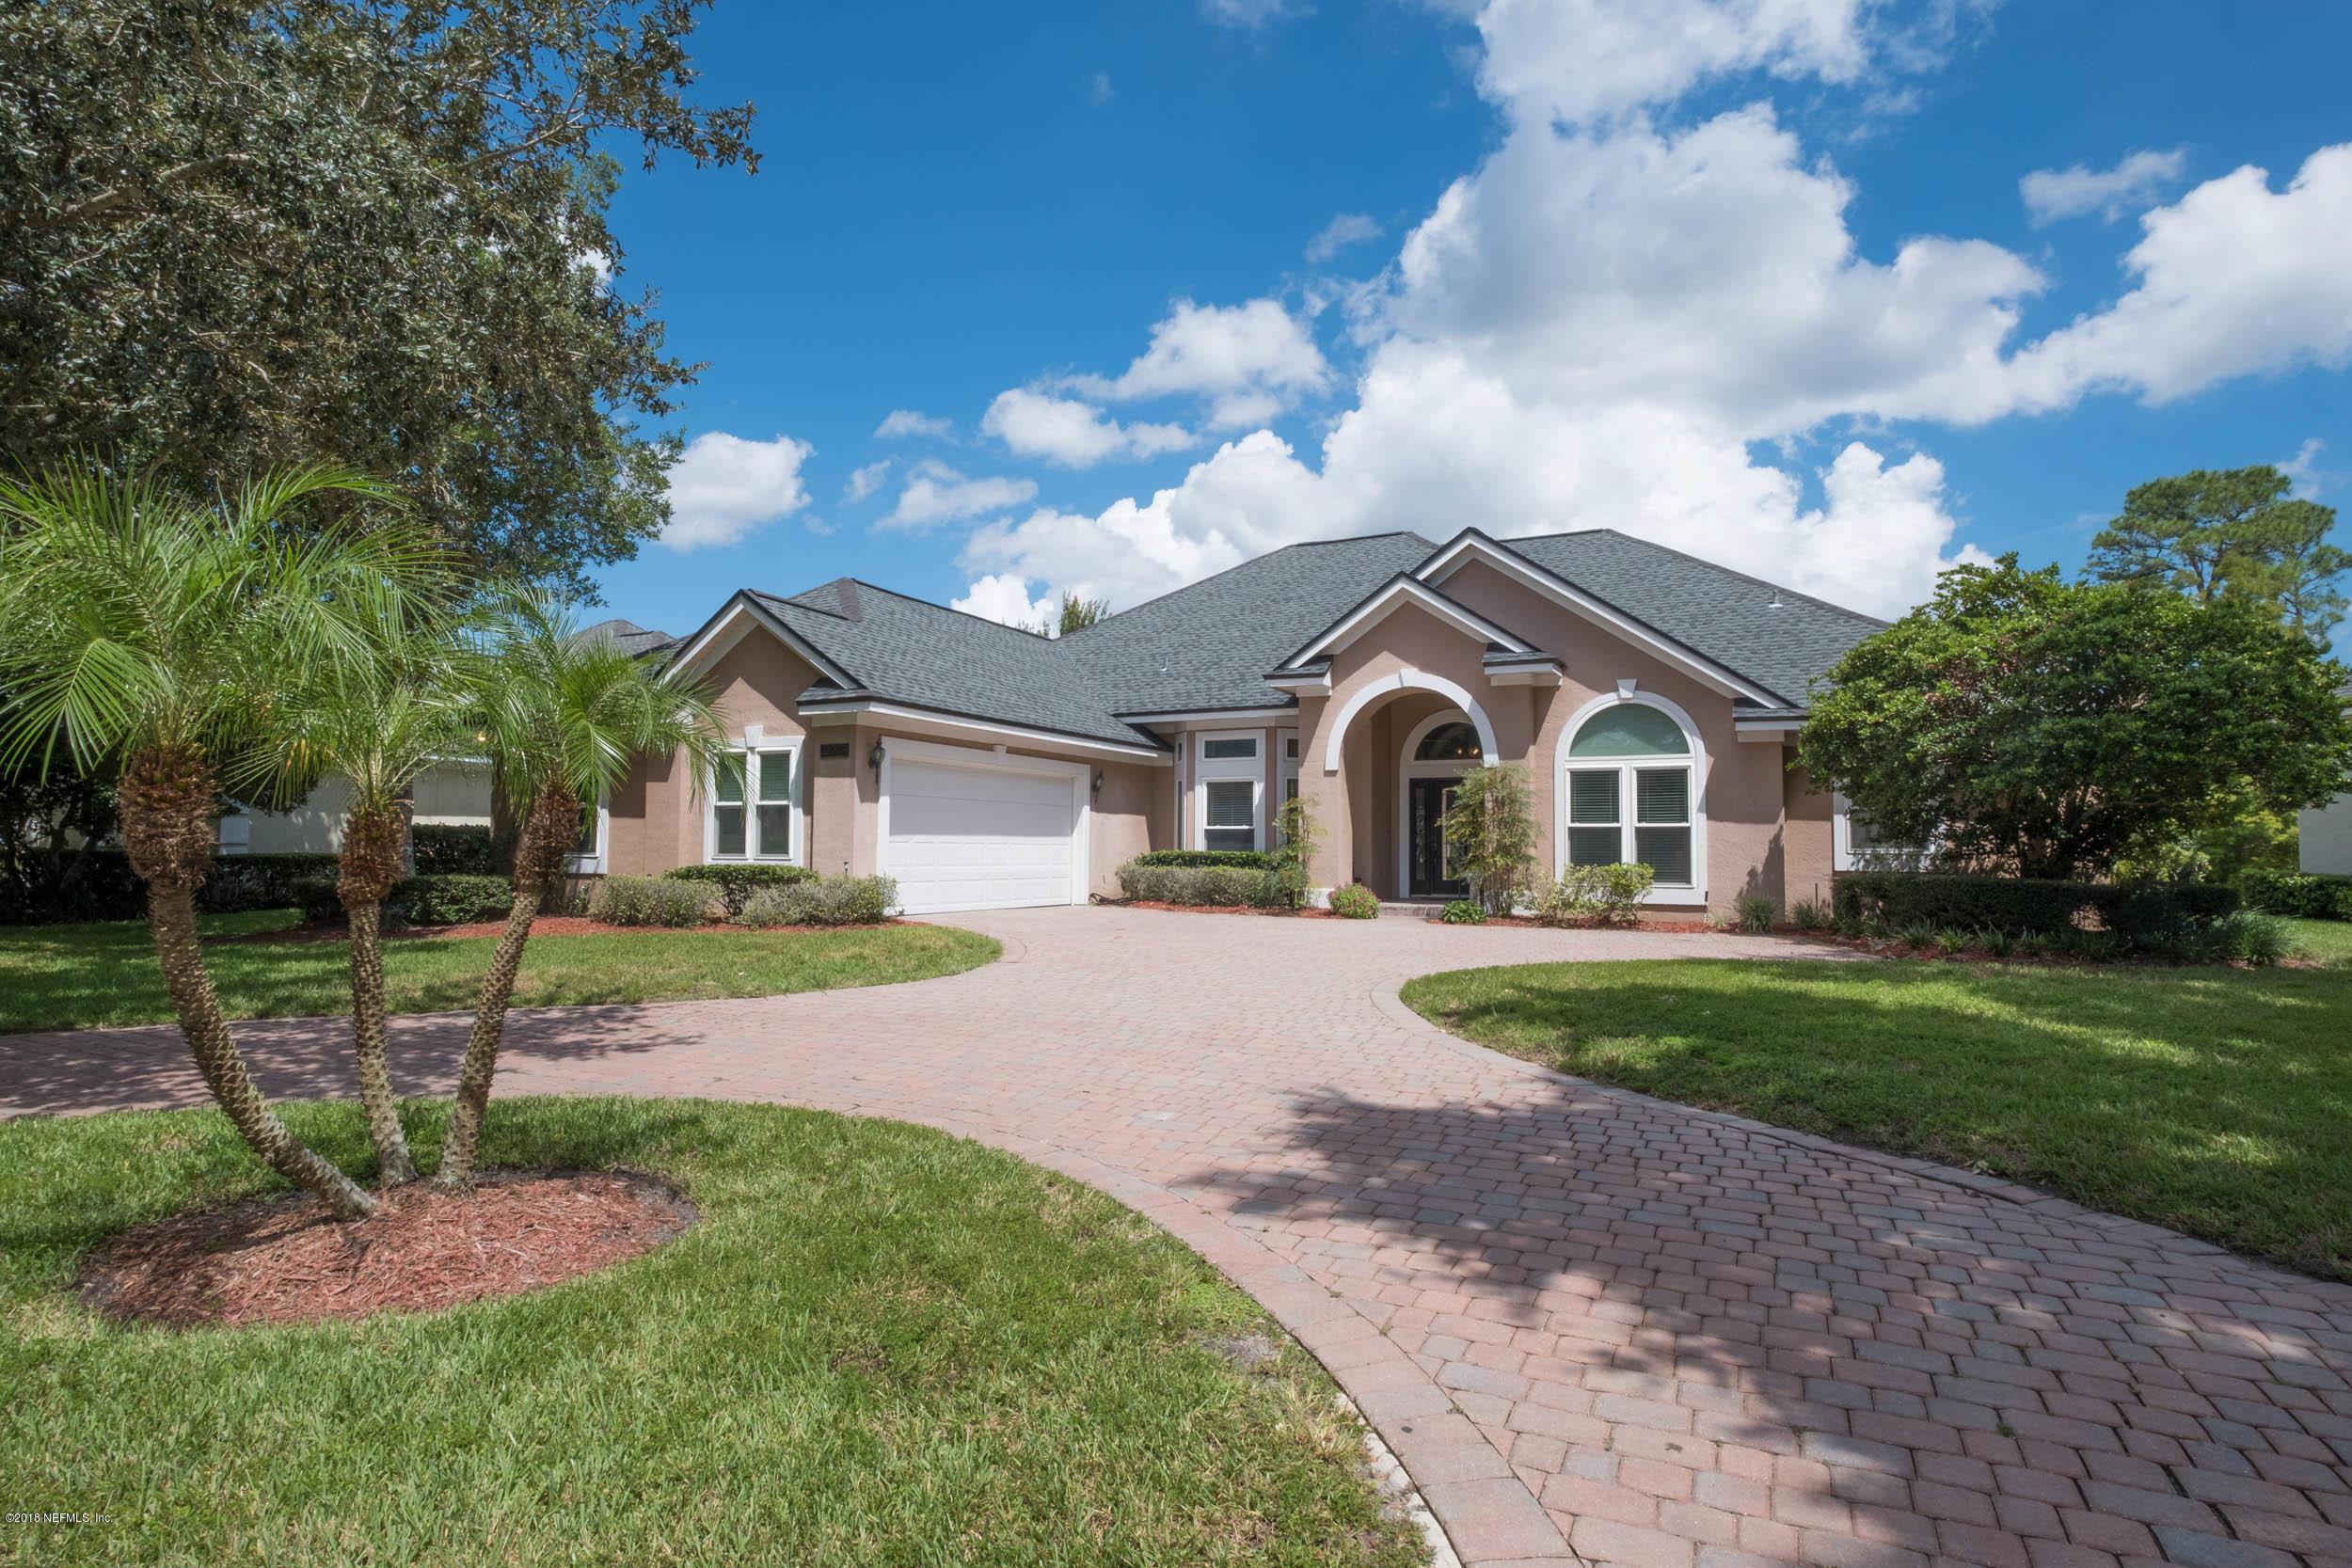 12775 BIGGIN CHURCH, JACKSONVILLE, FLORIDA 32224, 4 Bedrooms Bedrooms, ,3 BathroomsBathrooms,Residential - single family,For sale,BIGGIN CHURCH,956786